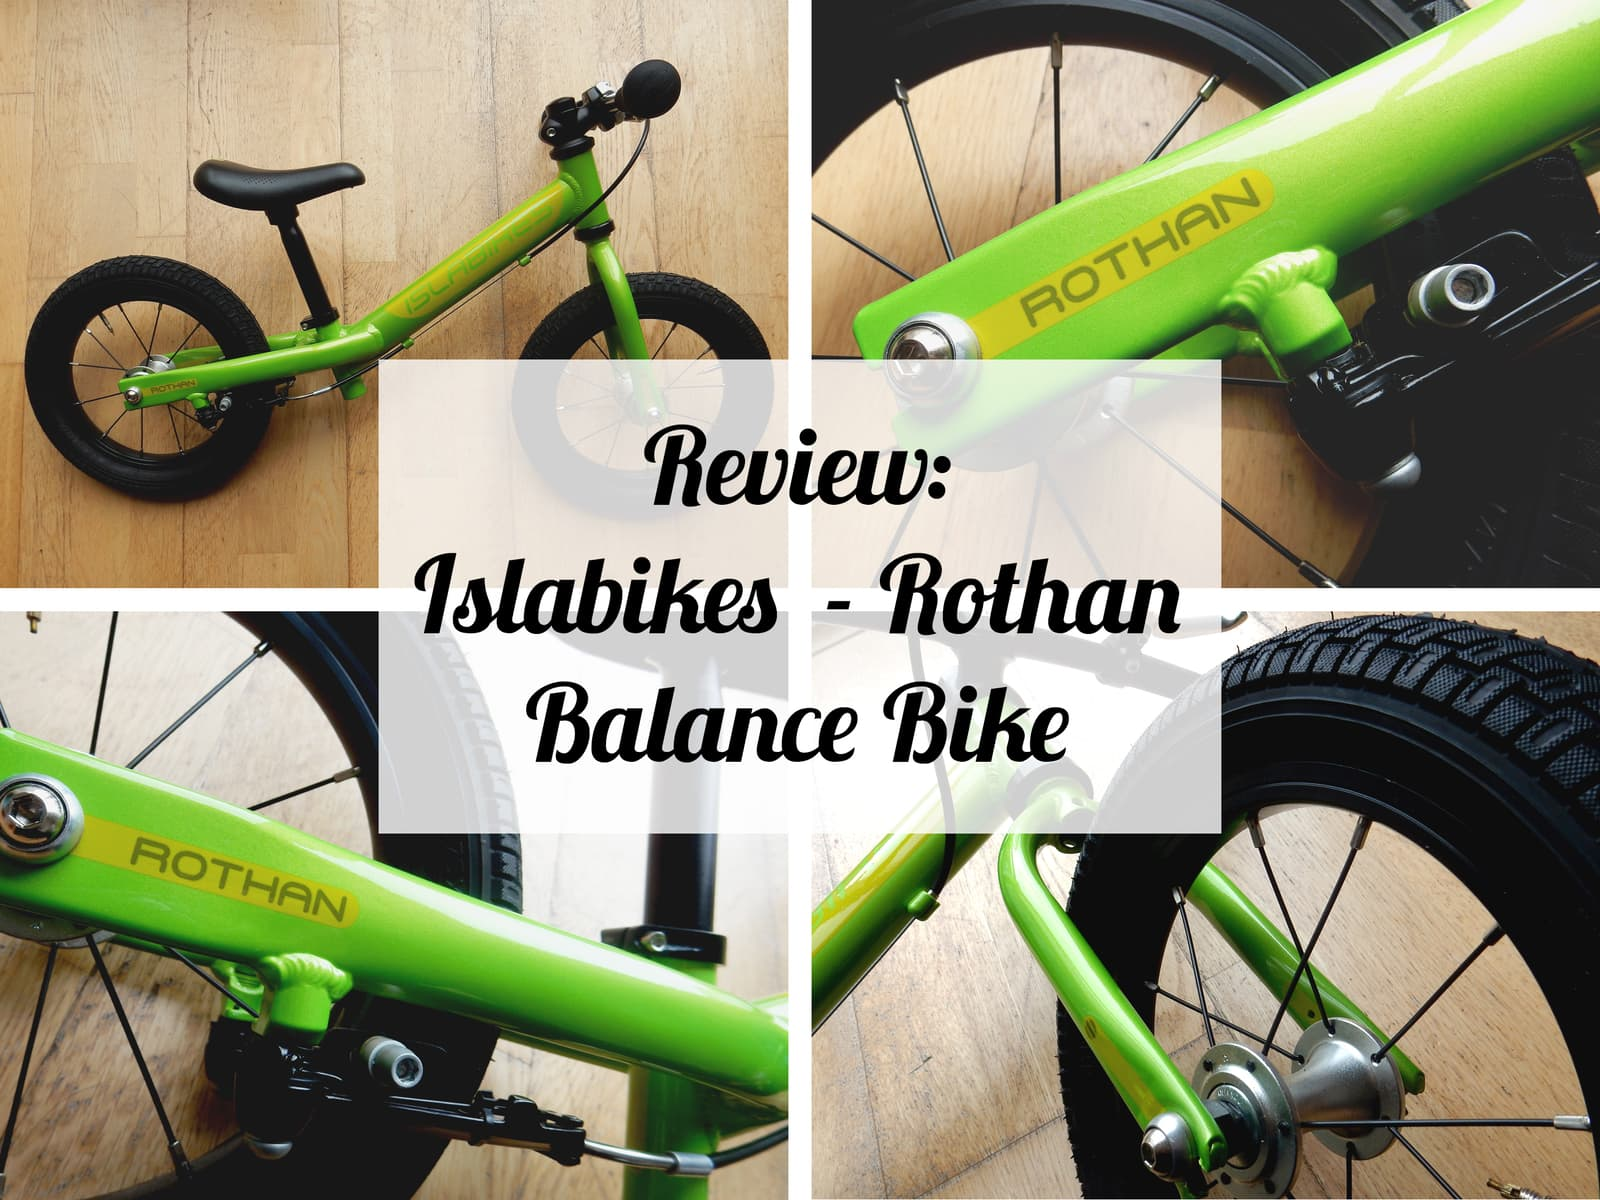 Rothan Balance Bike